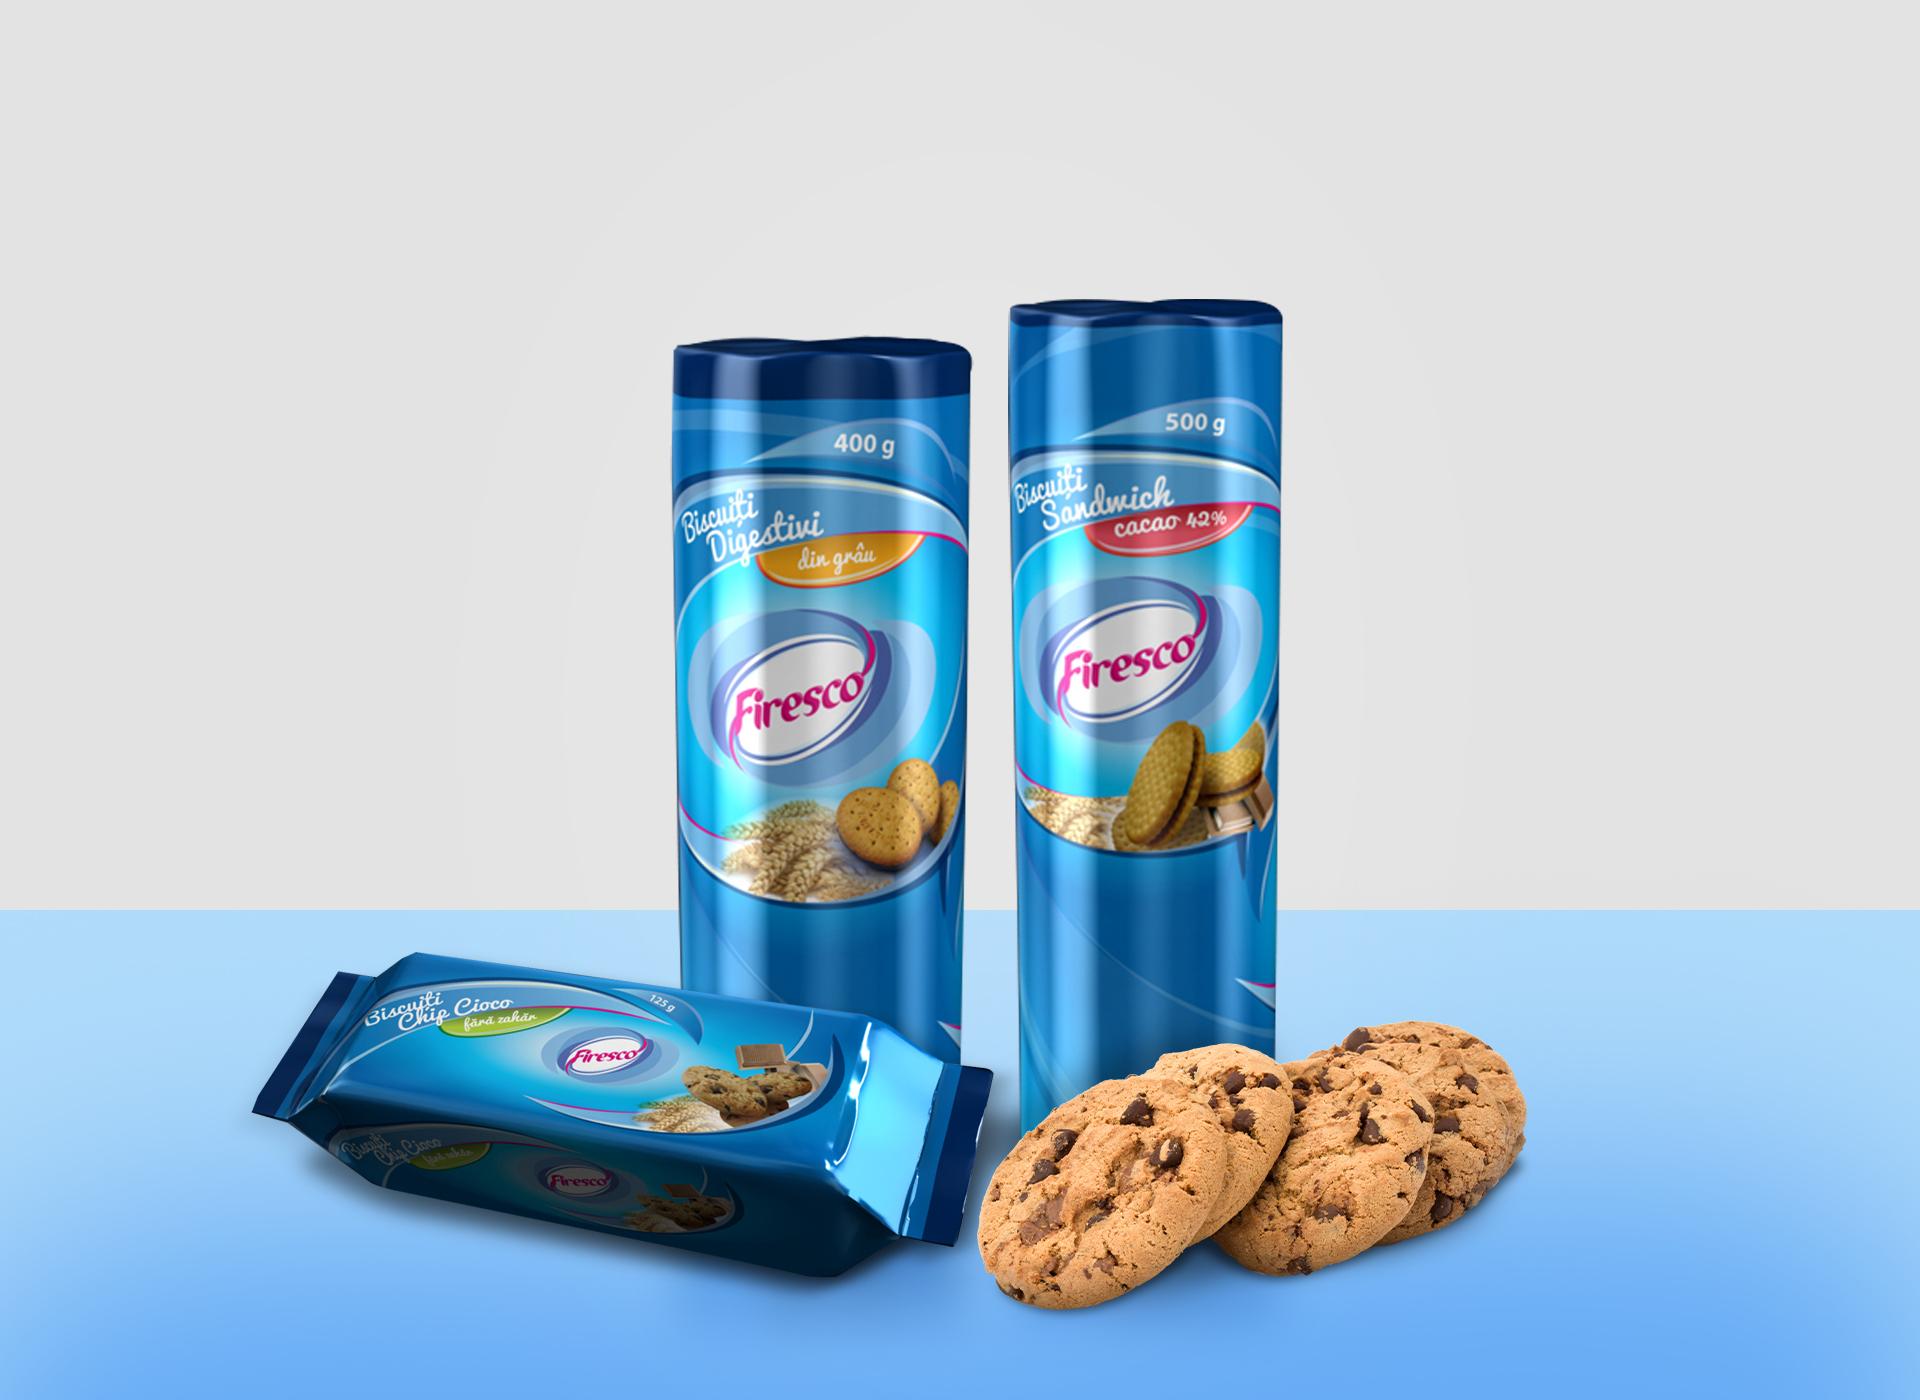 firesco rebranding inoveo biscuiti